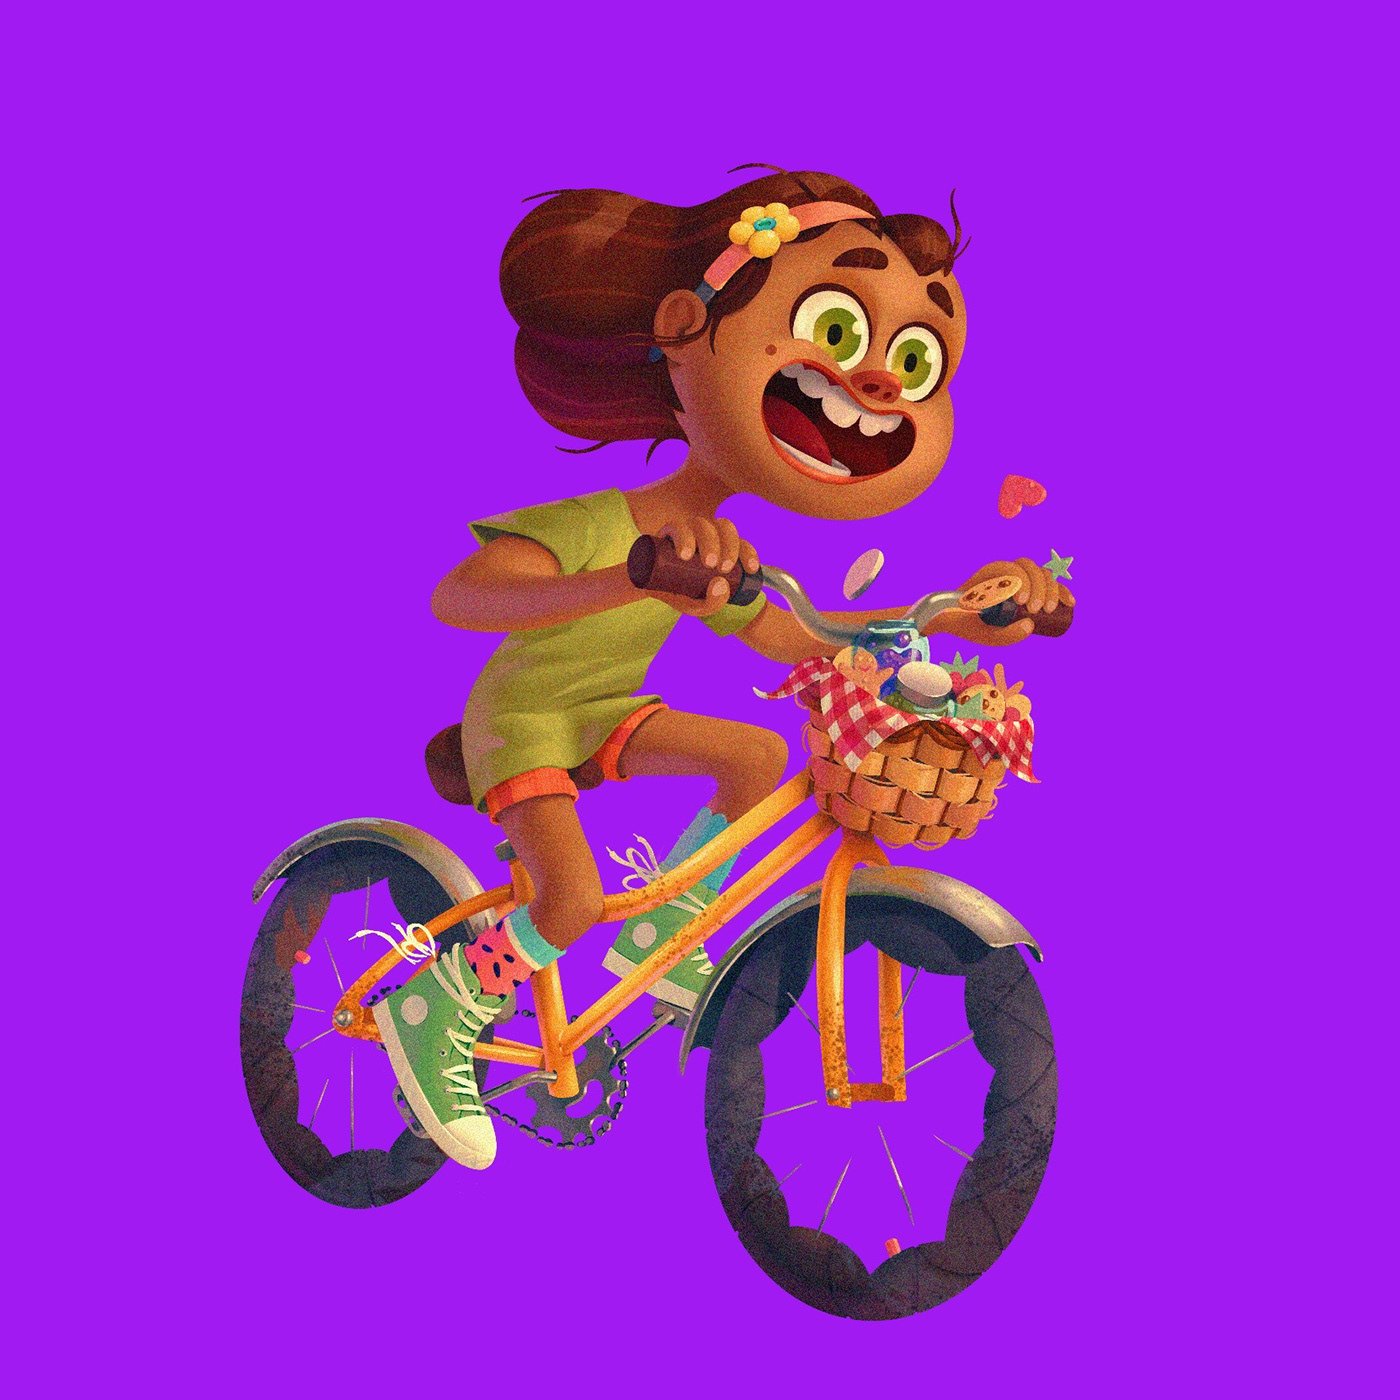 Image may contain: cartoon and bicycle